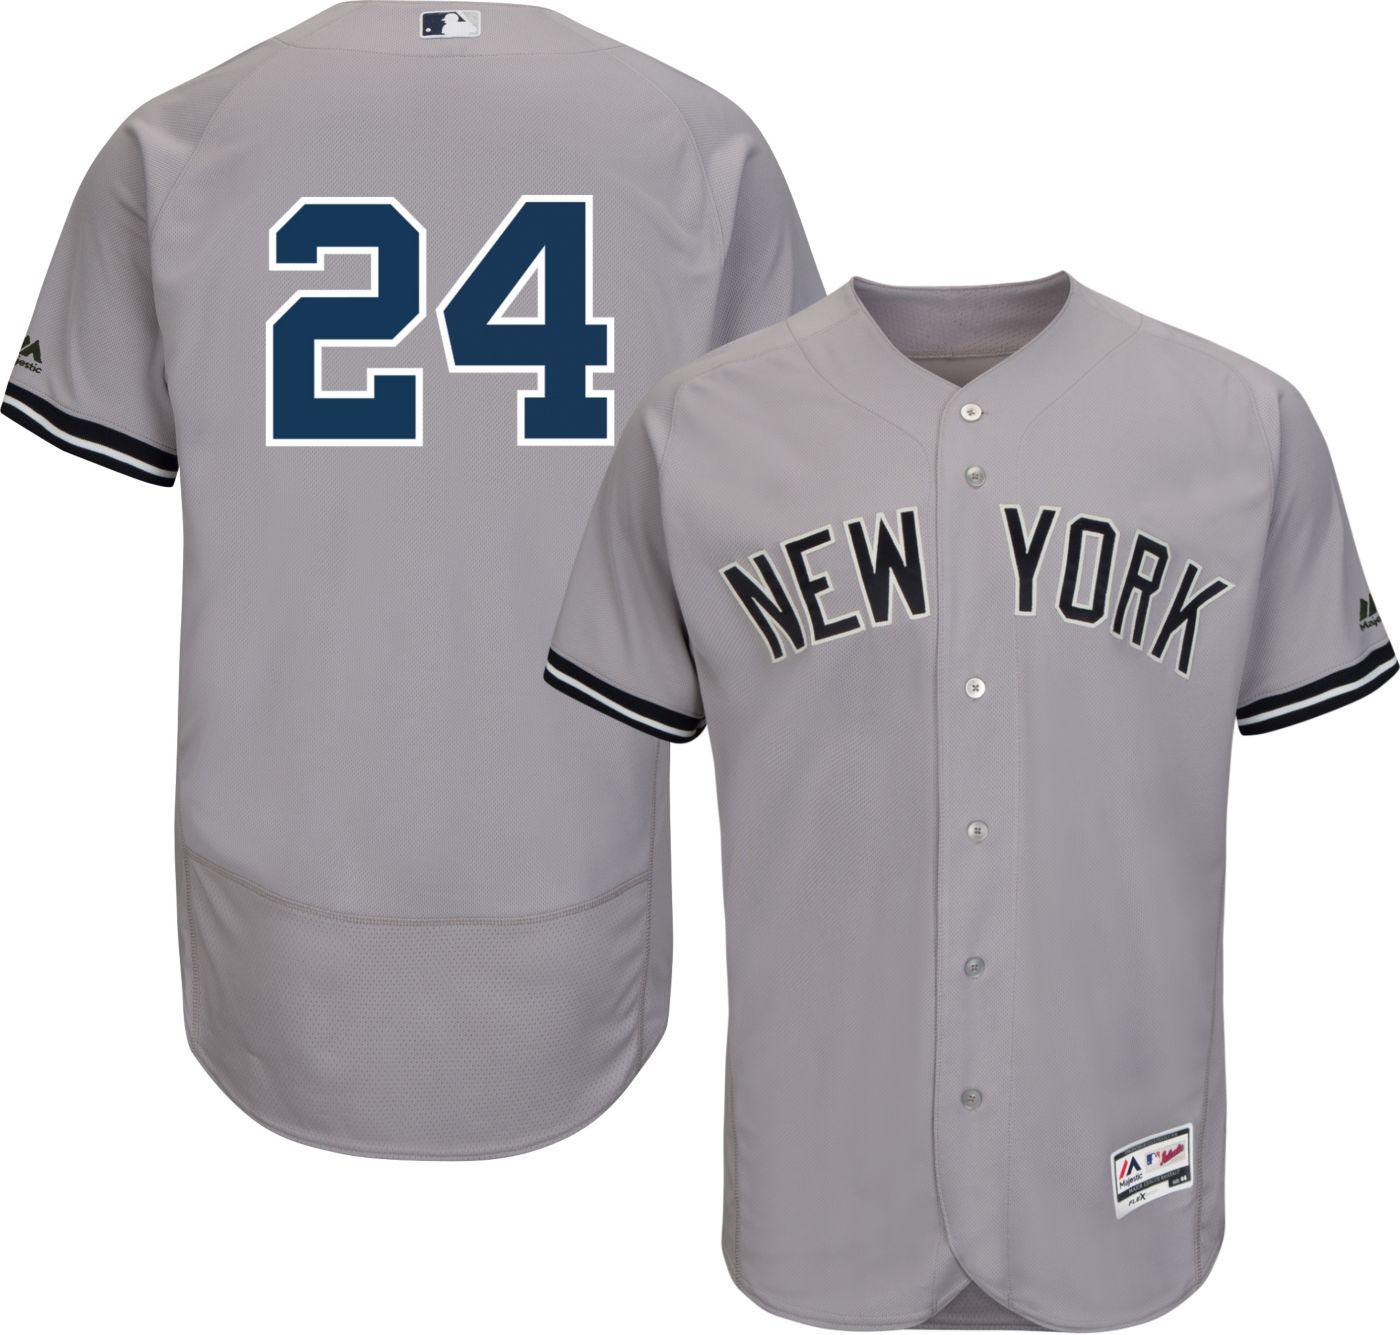 Majestic Men's Authentic New York Yankees Gary Sanchez #24 Flex Base Road Grey On-Field Jersey